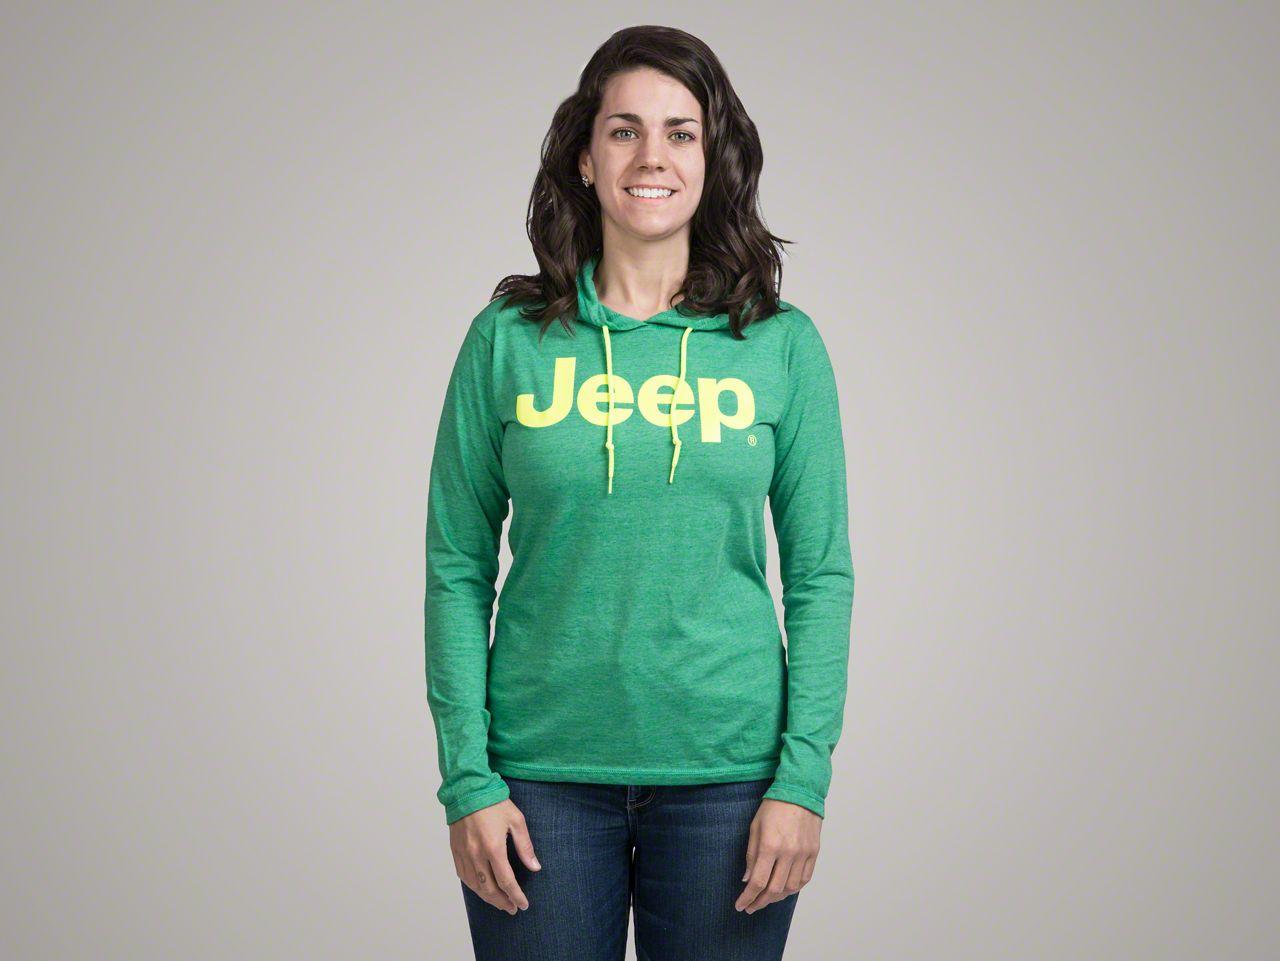 Ladies Bright Green Hooded T-Shirt - Medium